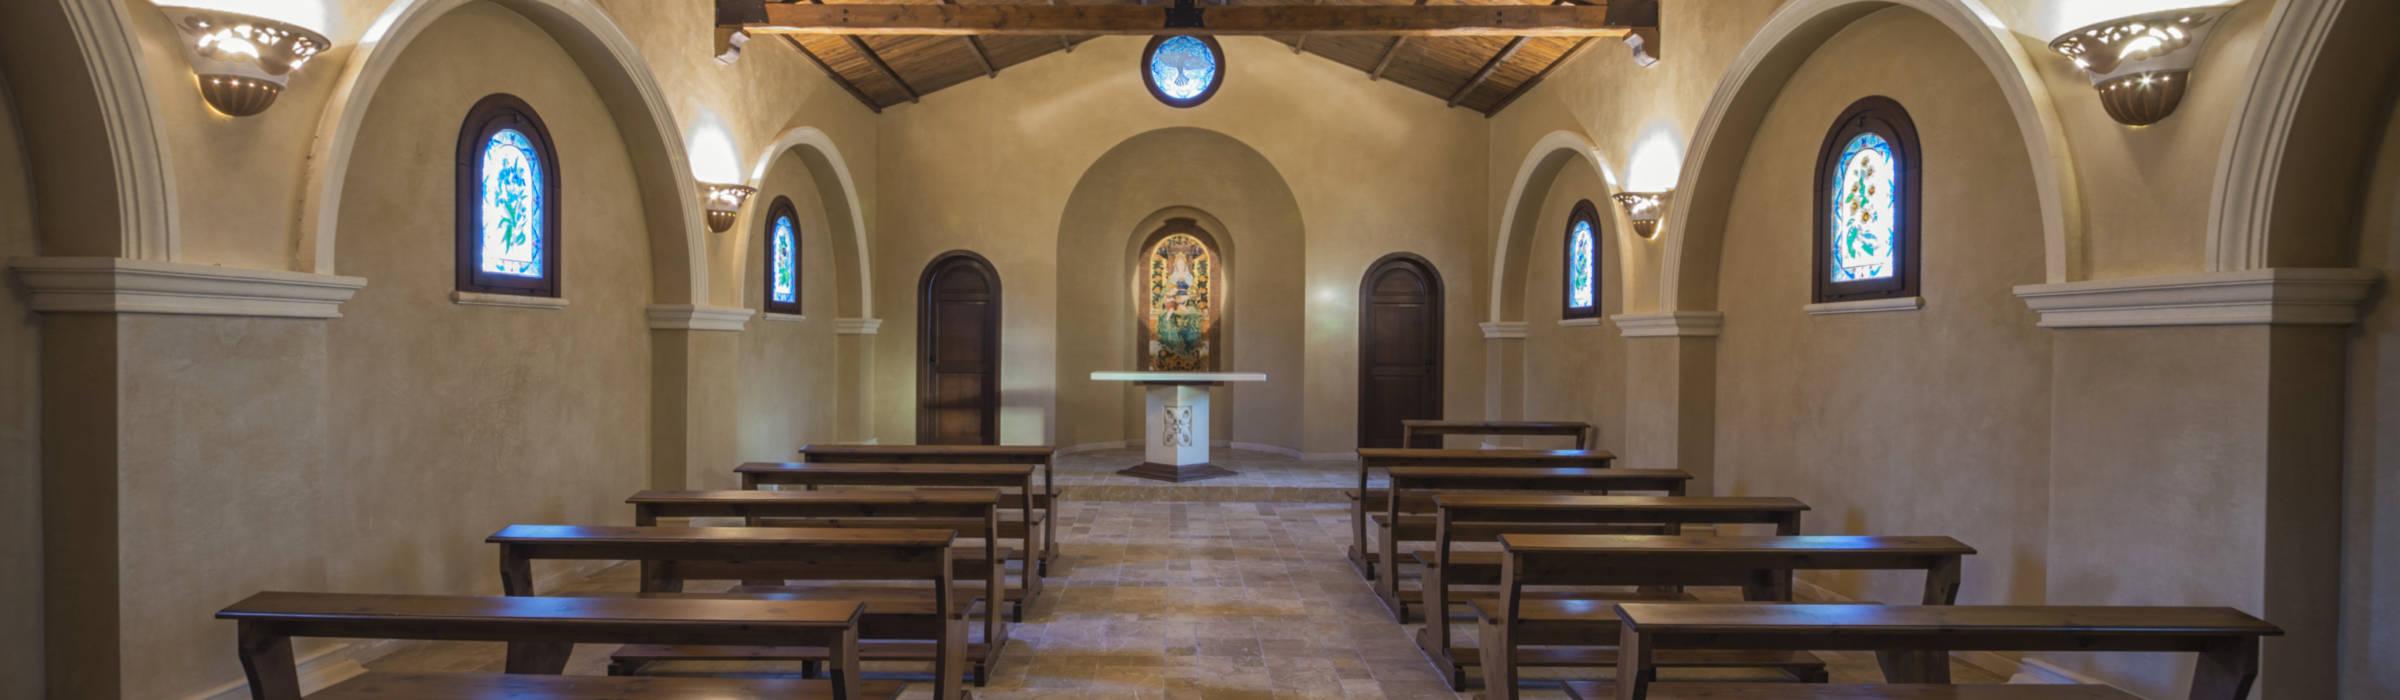 Borgo Ducale - Sala Ricevimenti